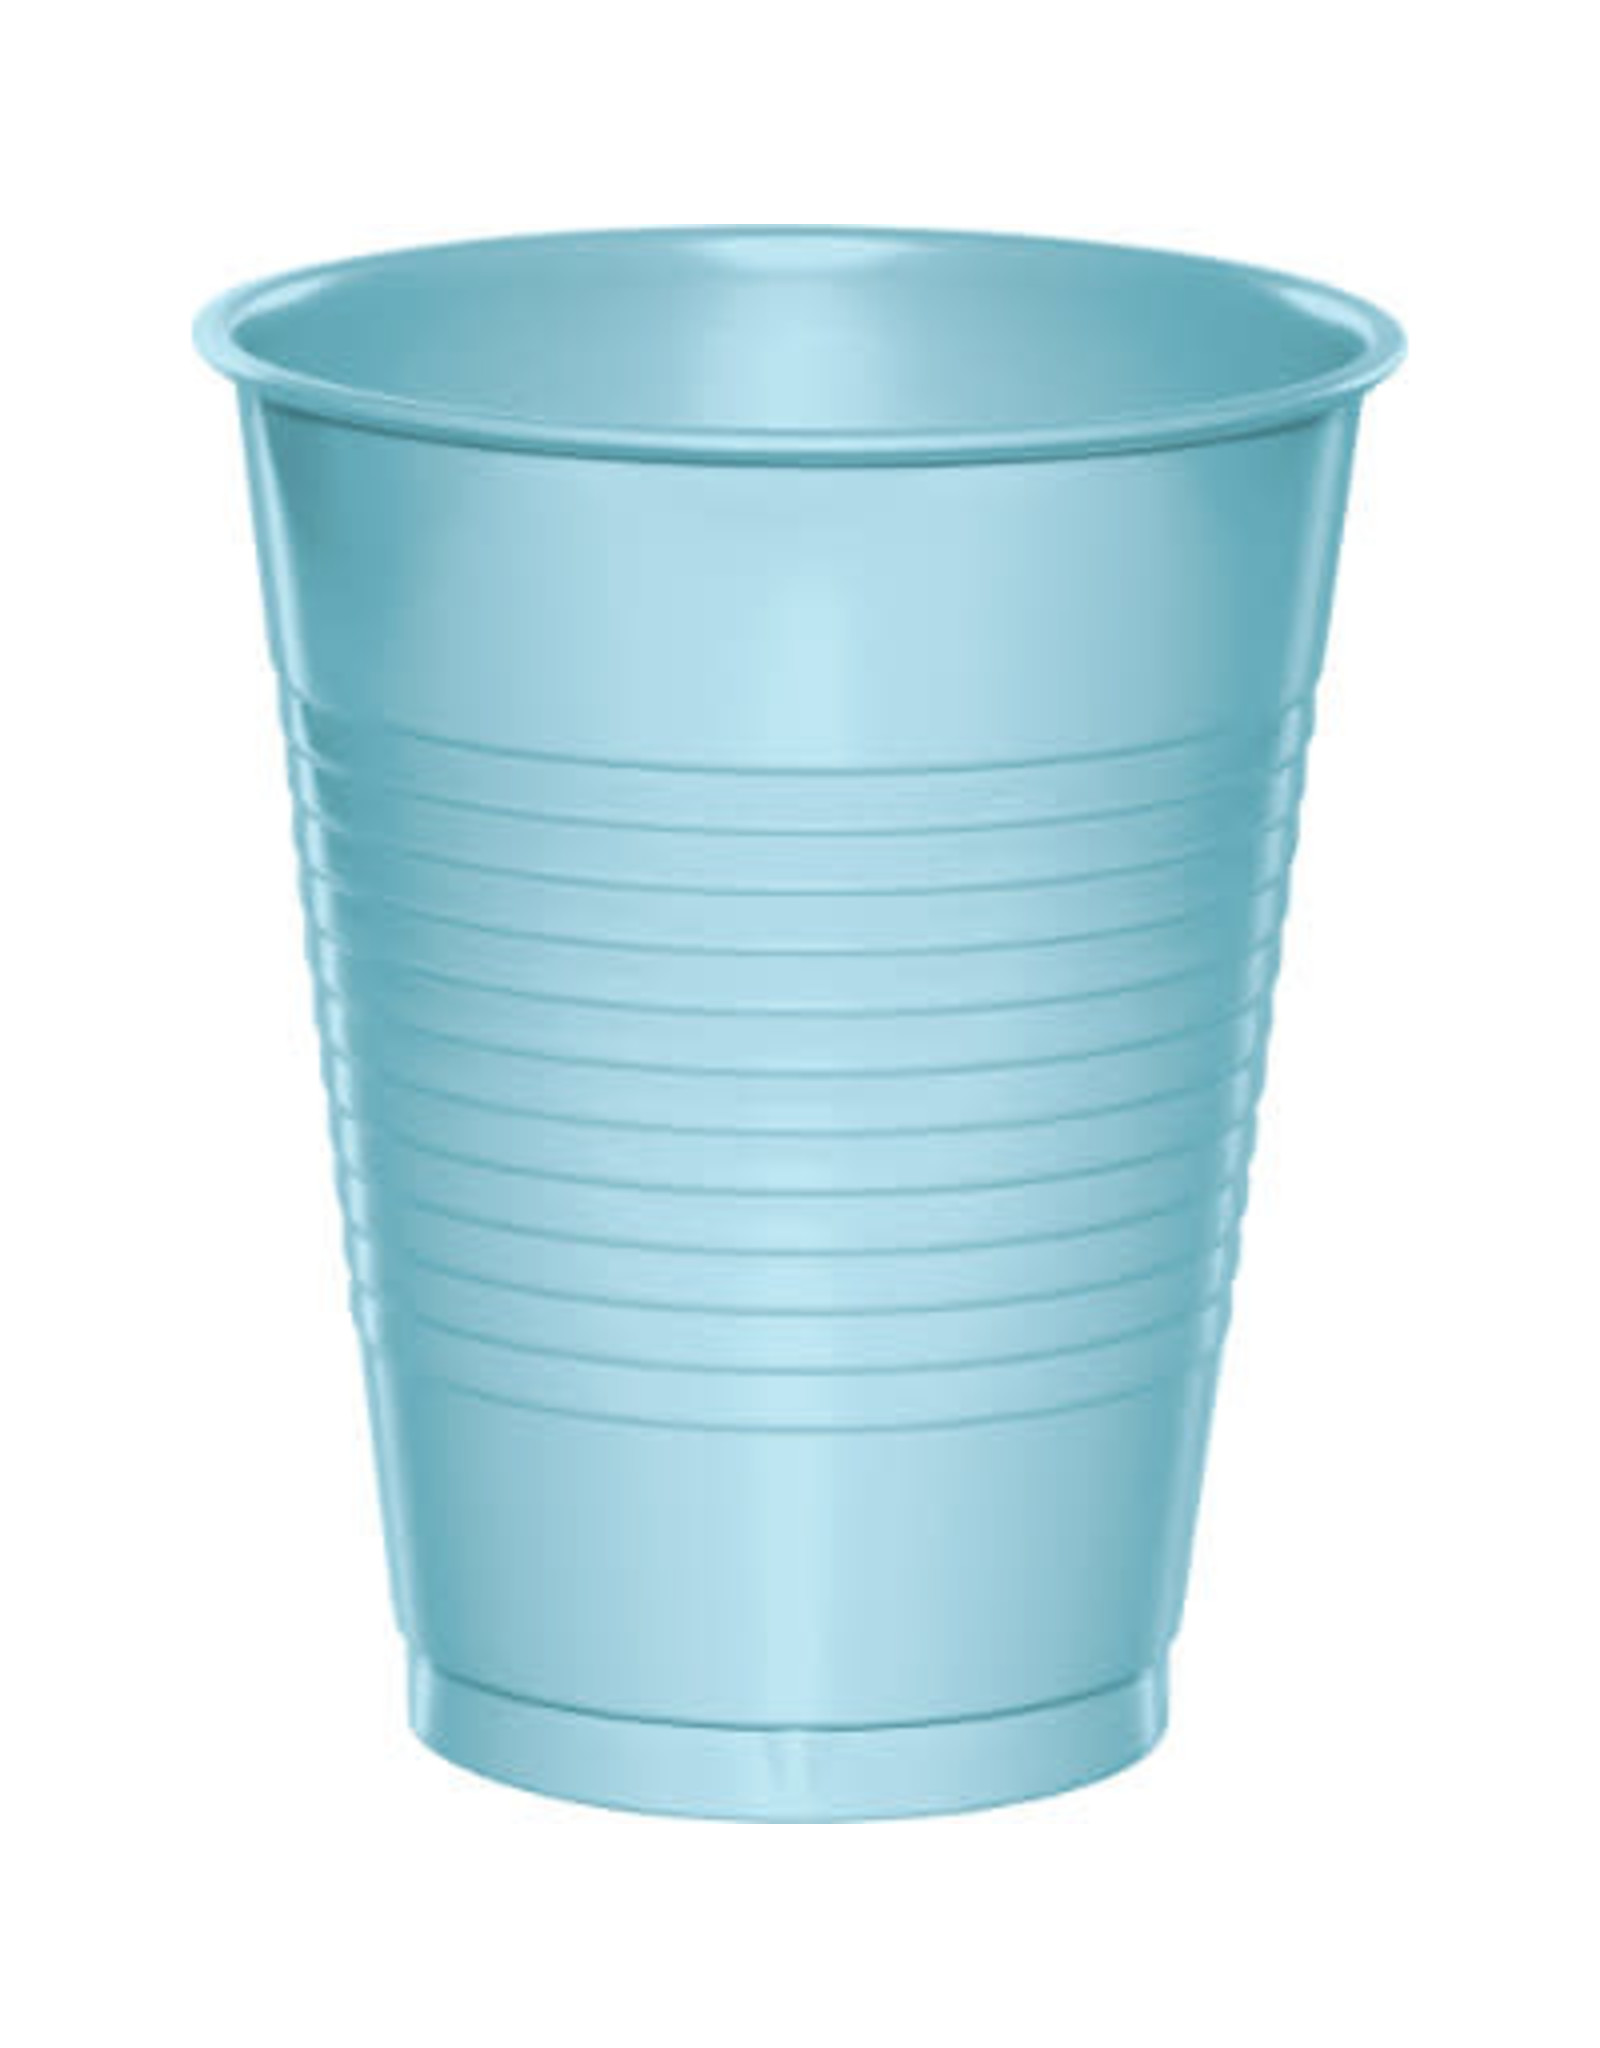 Touch of Color 16oz PASTEL BLUE PLASTIC CUPS